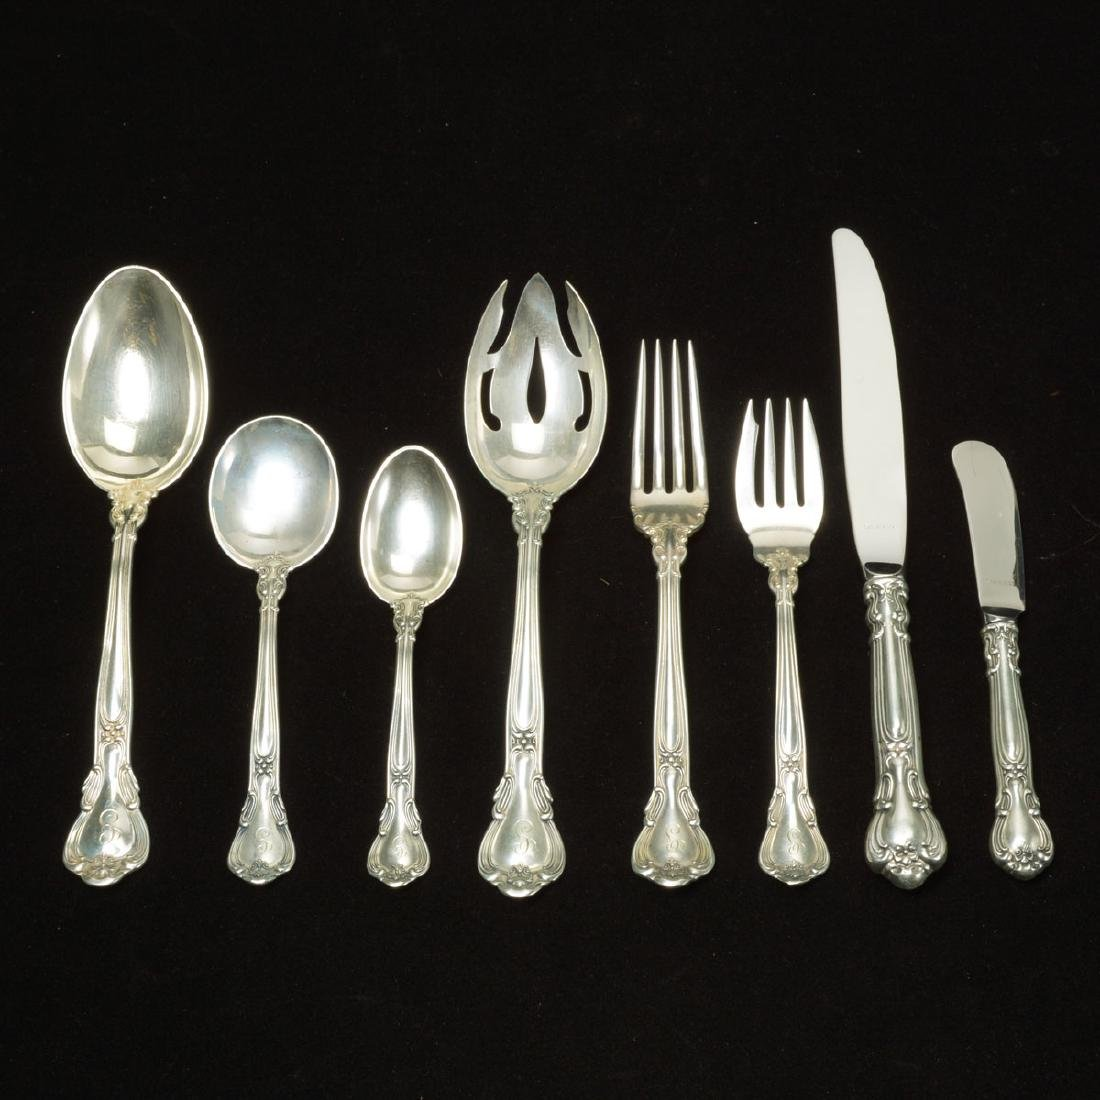 Gorham Chantilly Sterling Silver  Flatware, Monogrammed